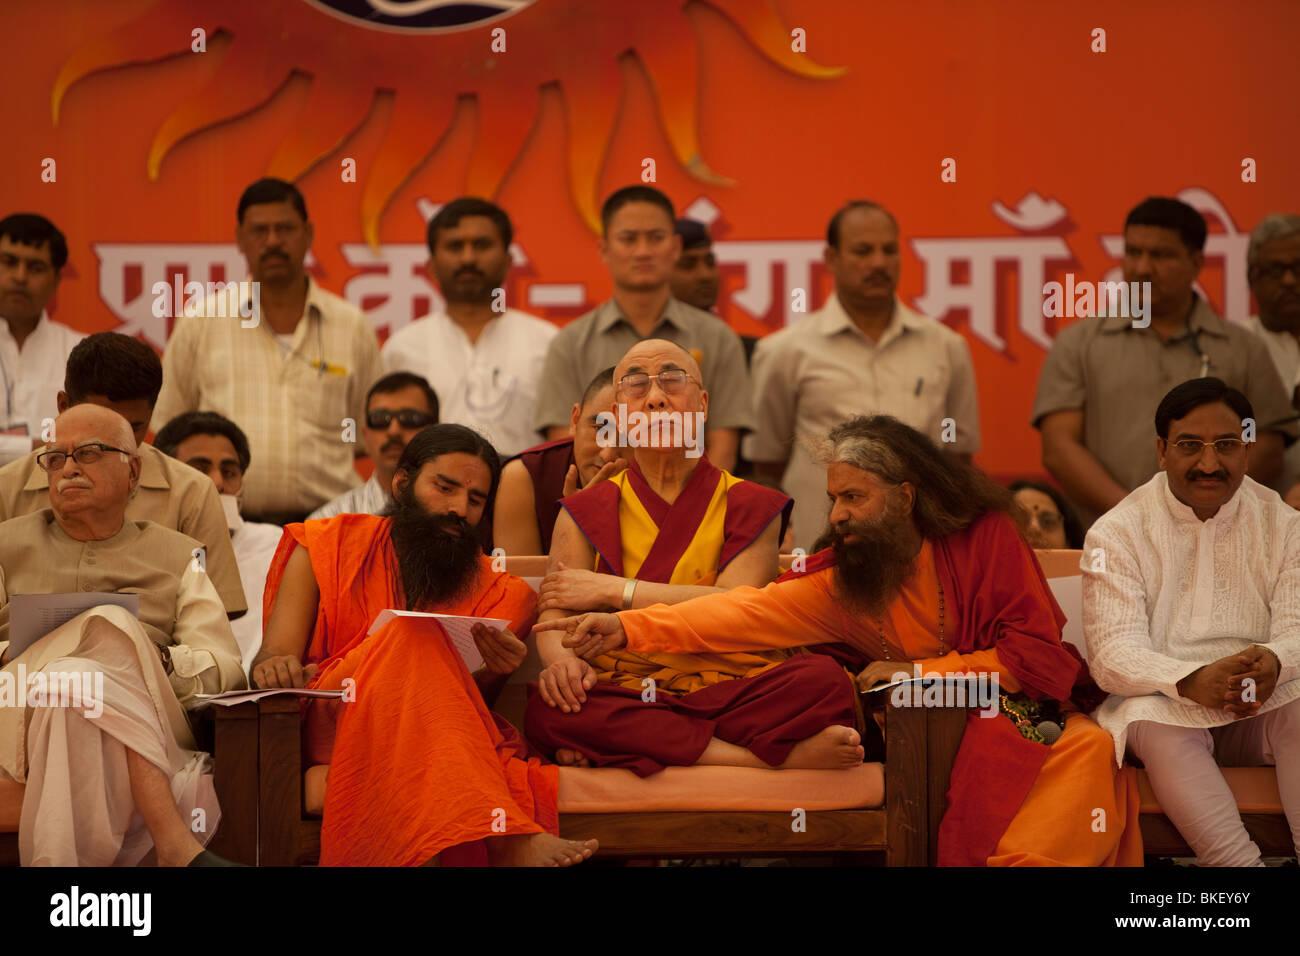 His Holiness the Dalai Lama in the presence of Parmarth Niketan guru Pujya Swamiji,  H.H. Swami Ramdevji, LK Advani, - Stock Image